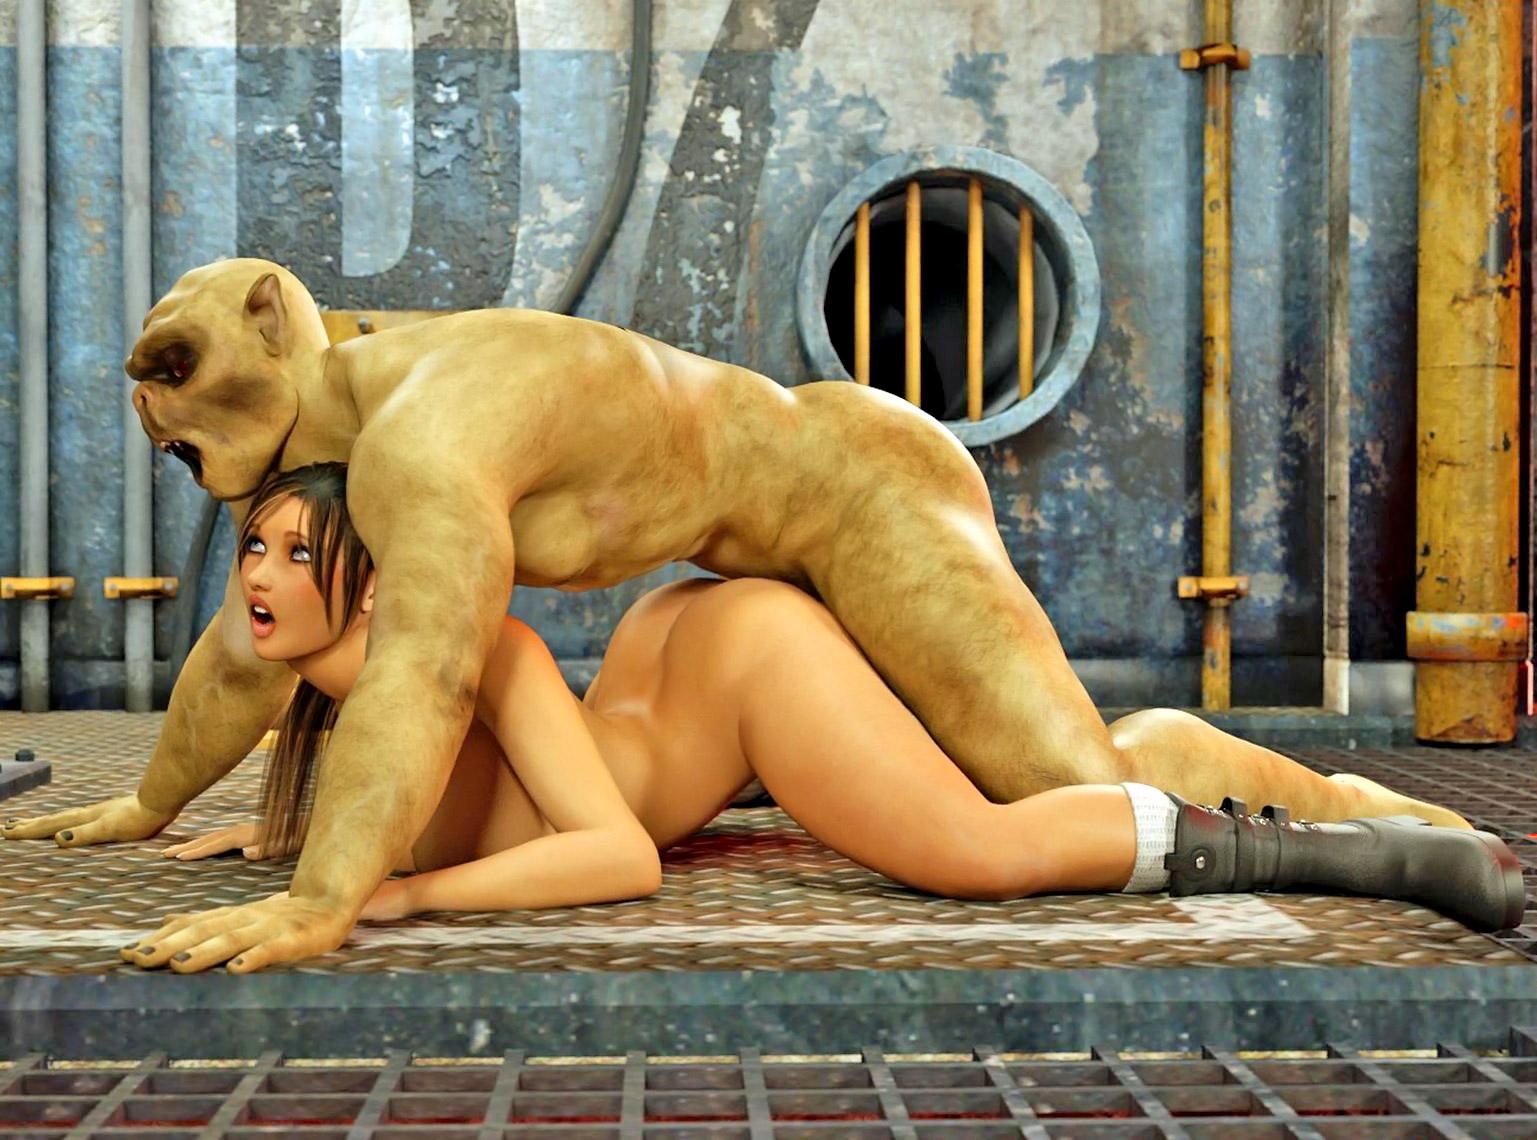 Lara croft big boobs naked pictures cartoon hardcore pics